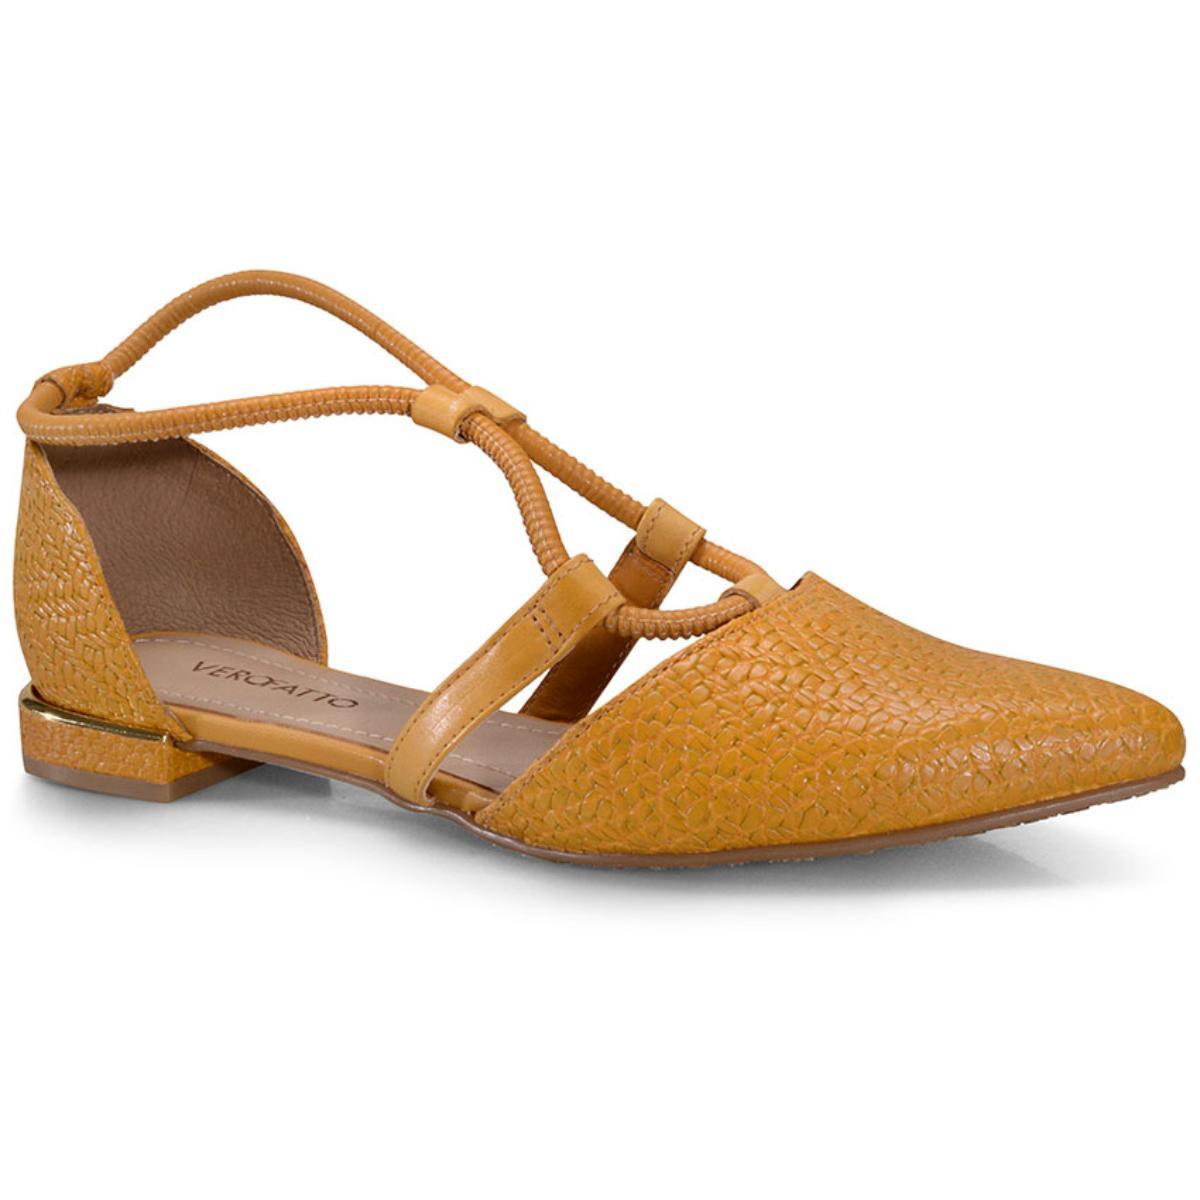 Sapatilha Feminina Verofatto 6018803 Amarelo